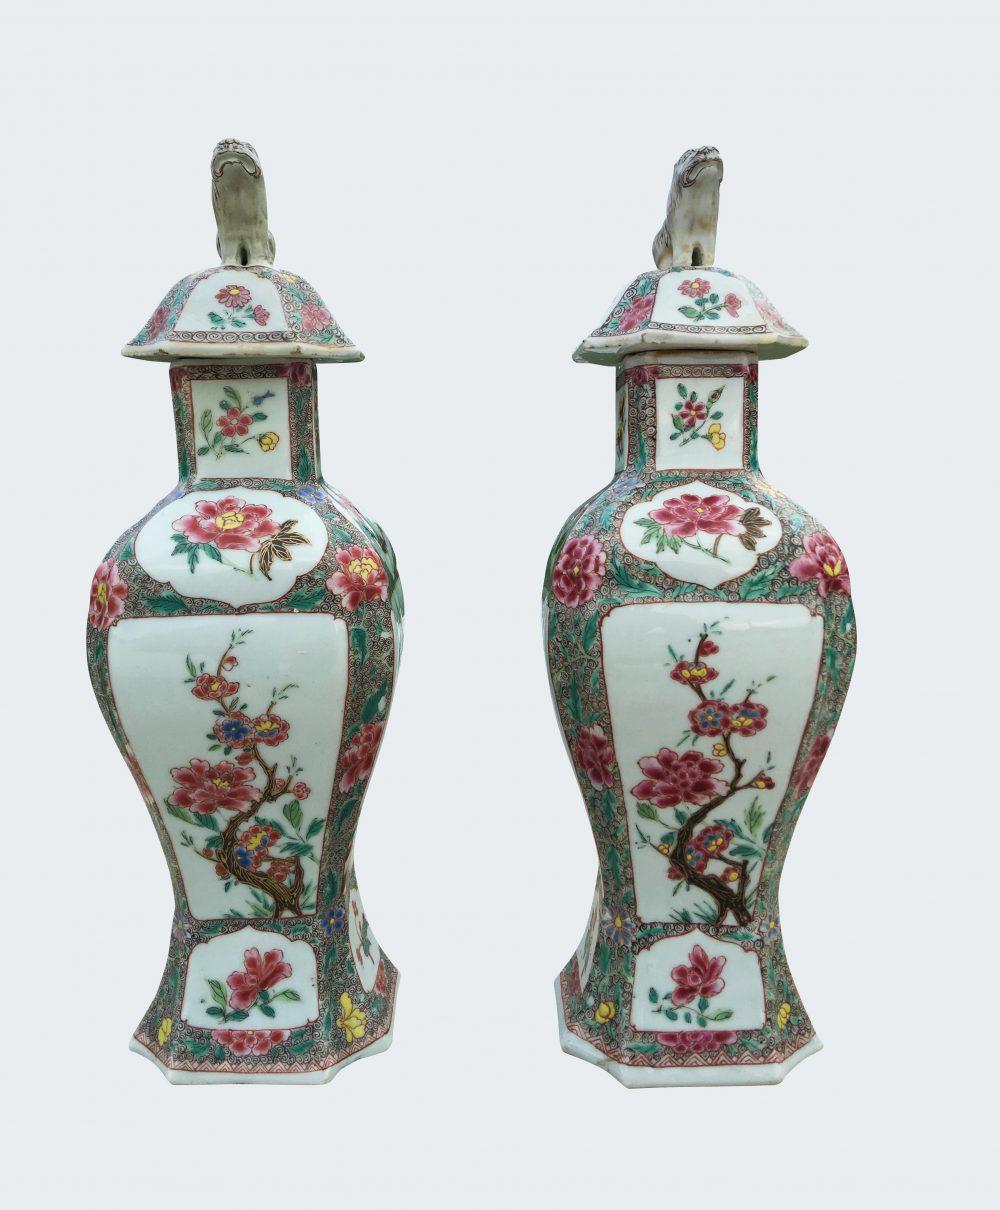 Famille rose Porcelain Qianlong period (1735-1795), circa 1730-1740, China